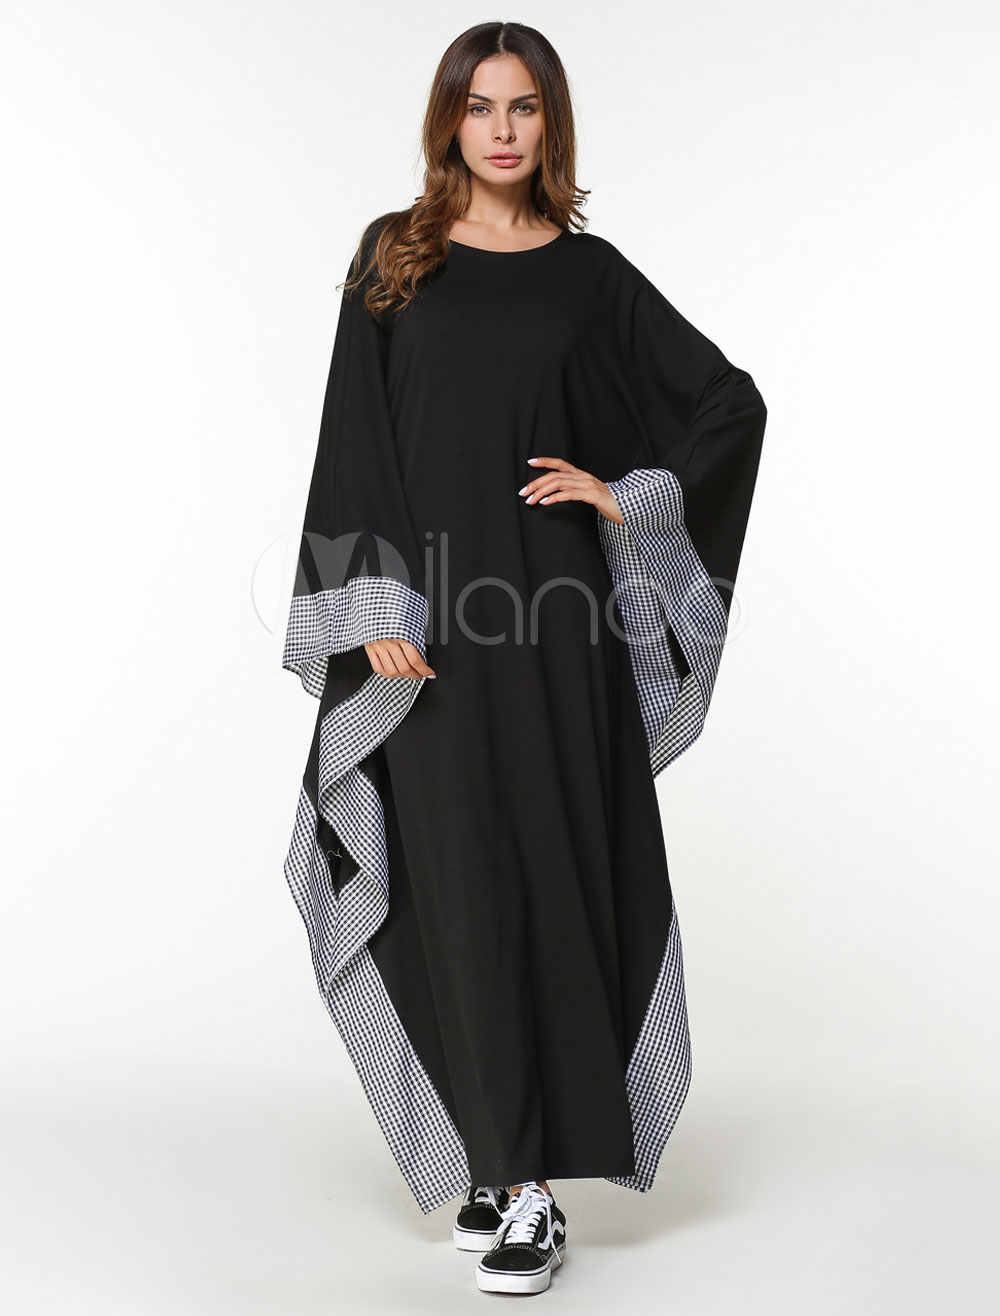 Black Abaya Dress Muslim Oversized Long Sleeve Batwing Women Maxi Kaftan Dress (Women\\'s Clothing Arabian Clothing) photo